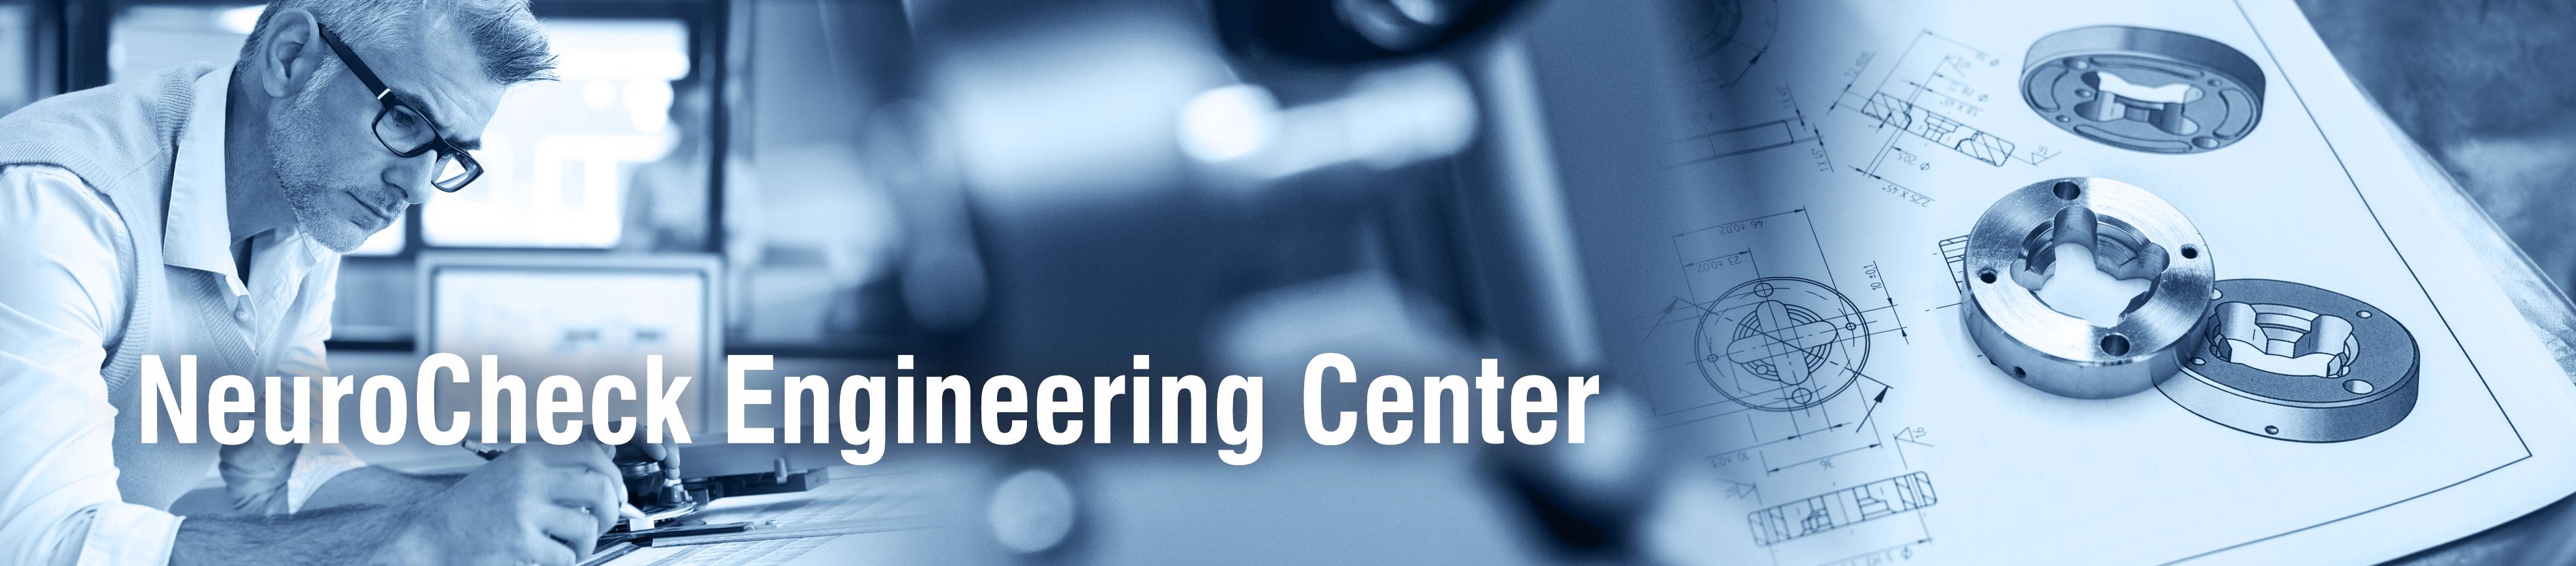 NeuroCheck Engineering Center (Image left © designed by goodluz - AdobeStock; right © ctvvelve - AdobeStock)